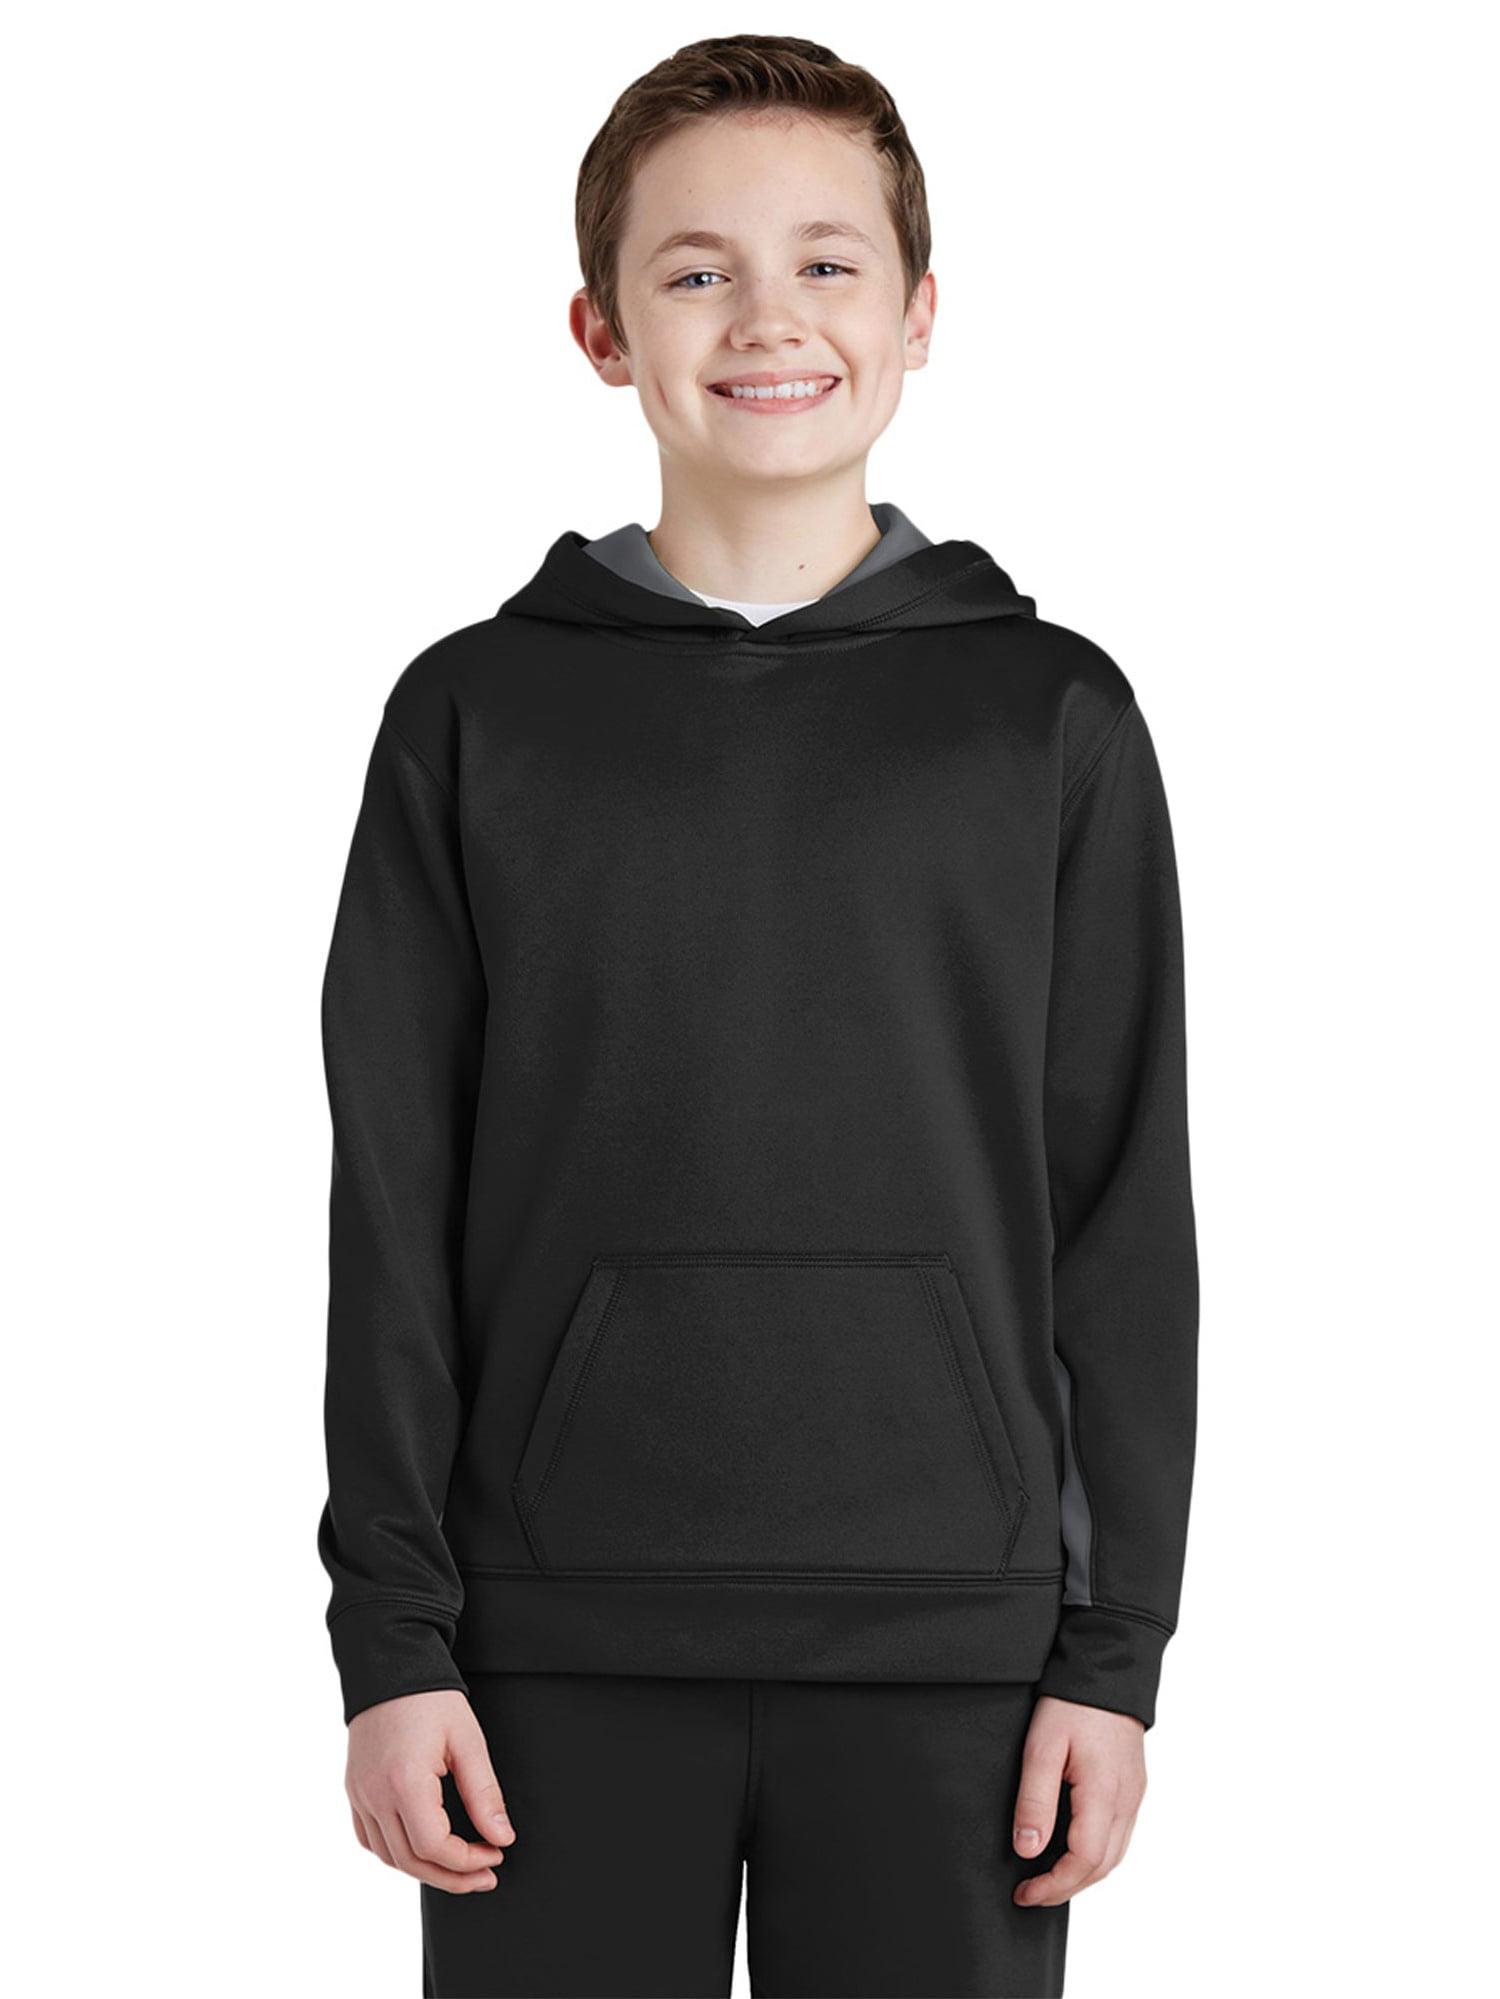 Sport-Tek Boy's Fleece Colorblock Hooded Pullover